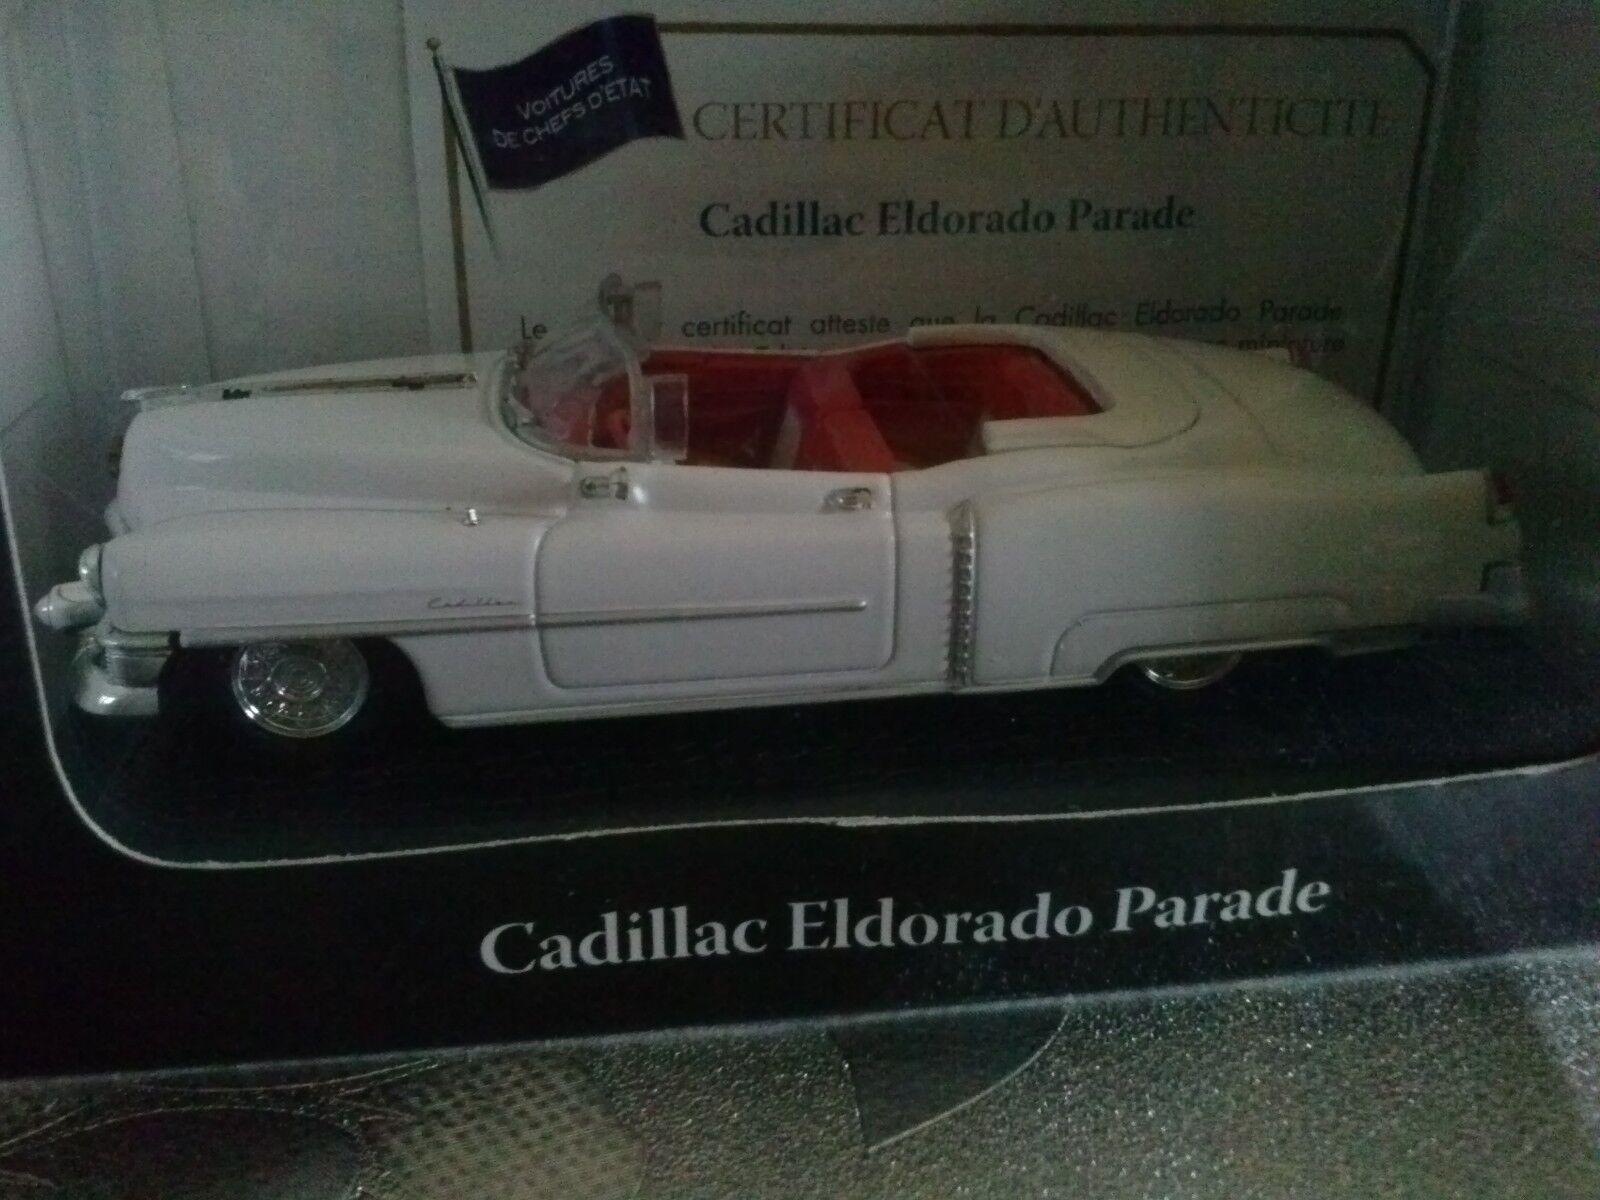 VOITURE CADILLAC ELDORADO PARADE 1 43